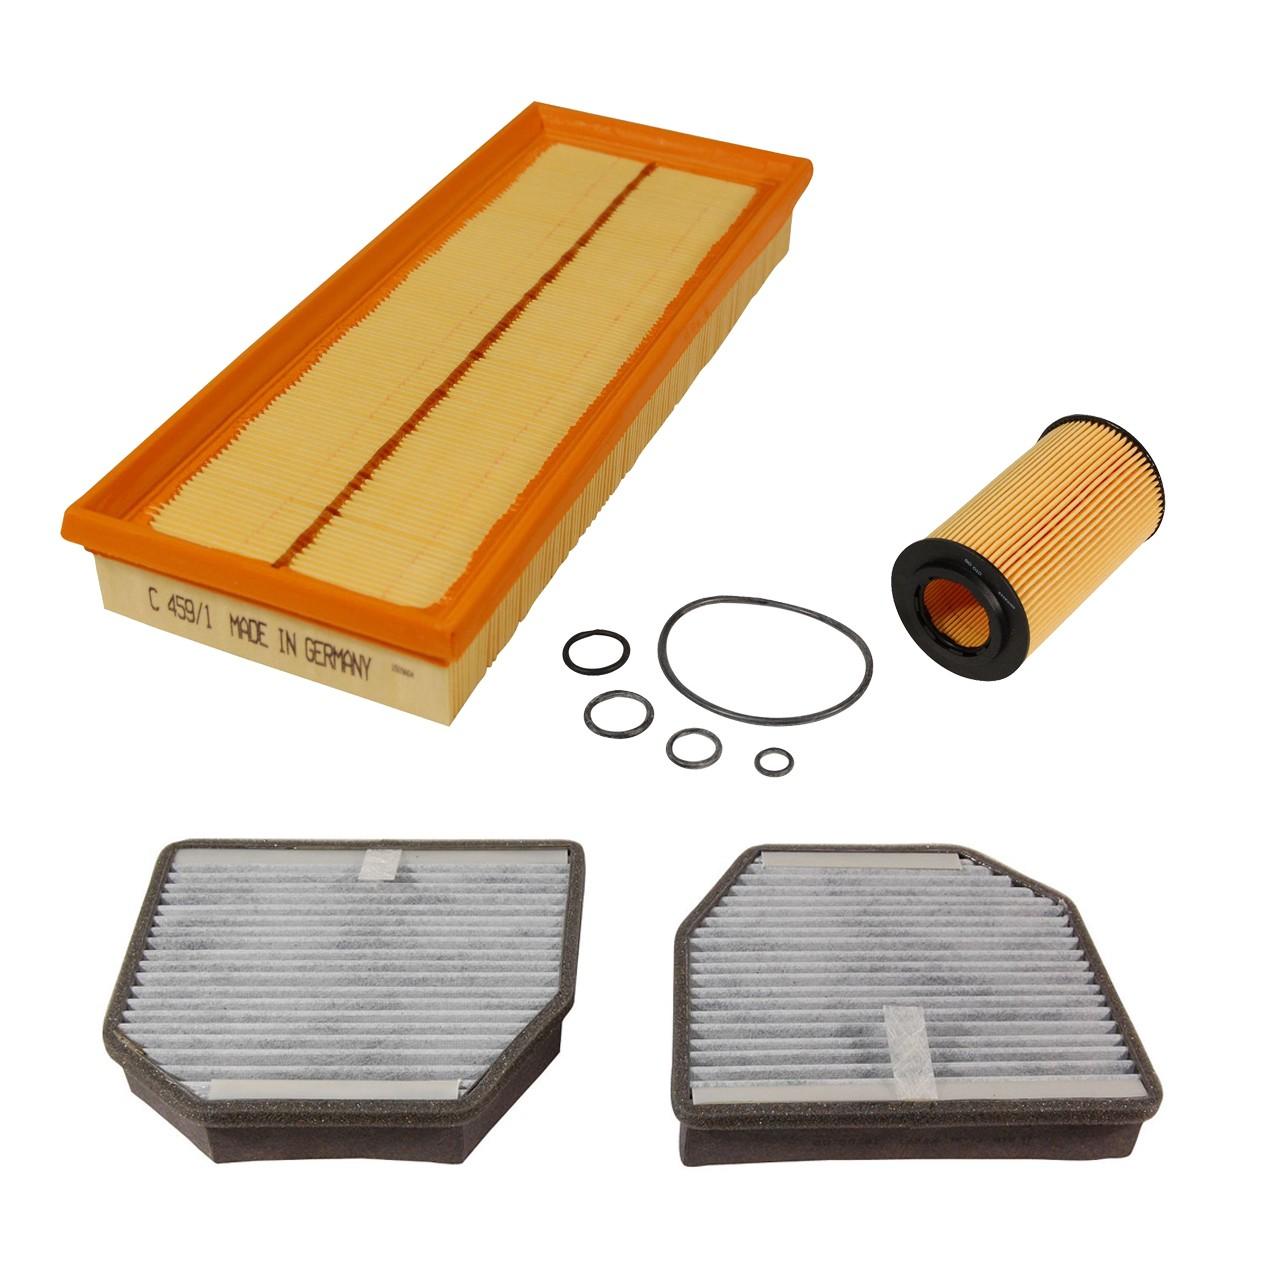 Inspektionskit Filterpaket Filterset für Mercedes SL R230 55AMG 475/500/517 PS